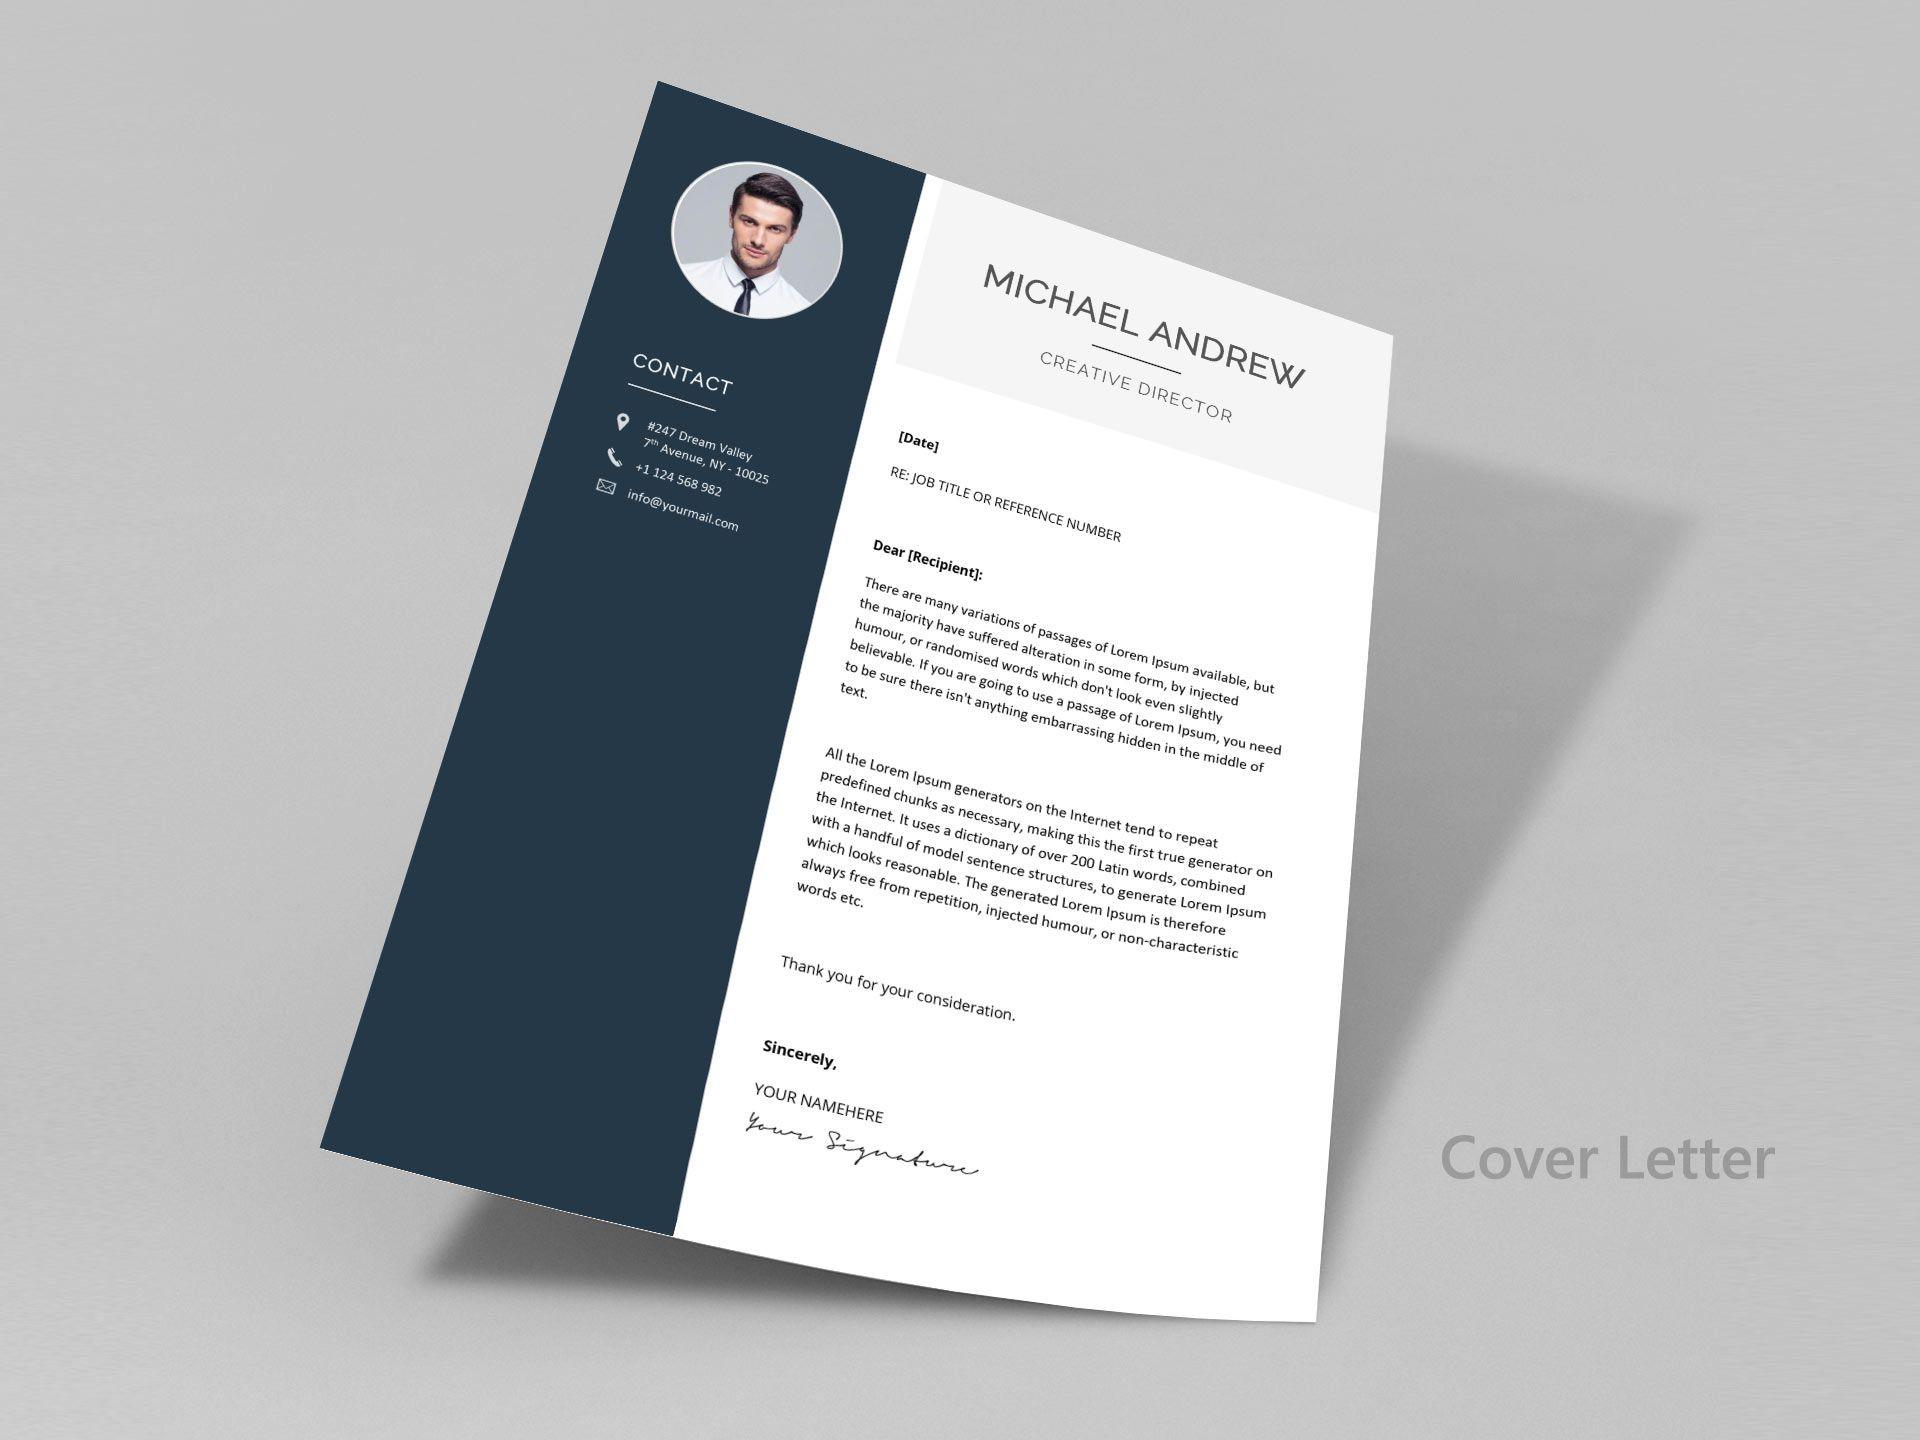 008 Awful Resume Template Microsoft Word 2019 Design  Free1920